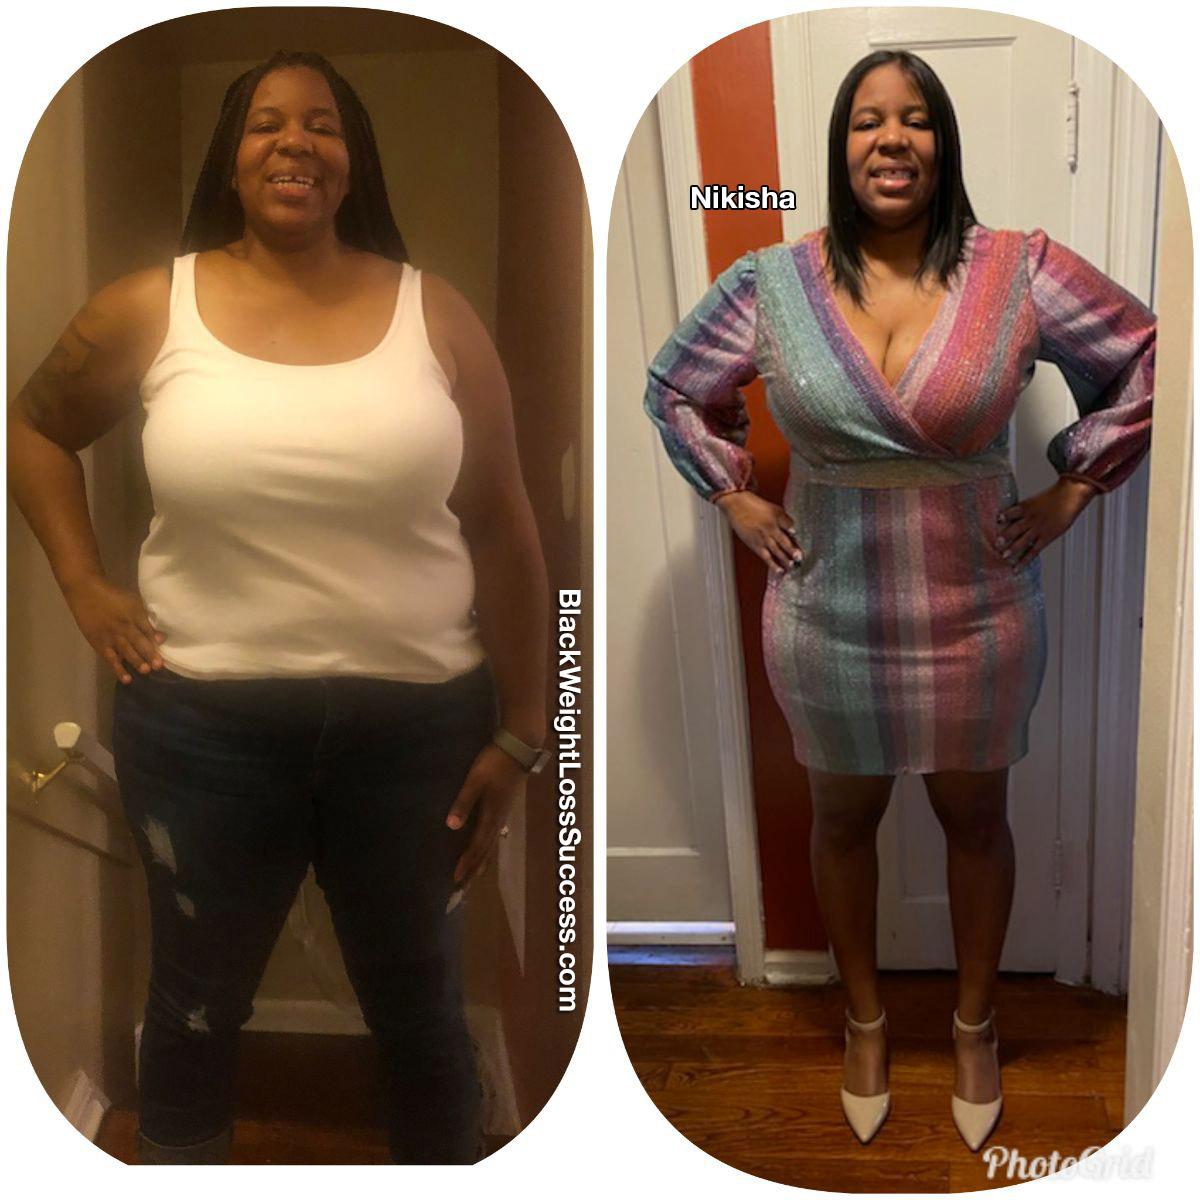 Nikisha before and after weight loss